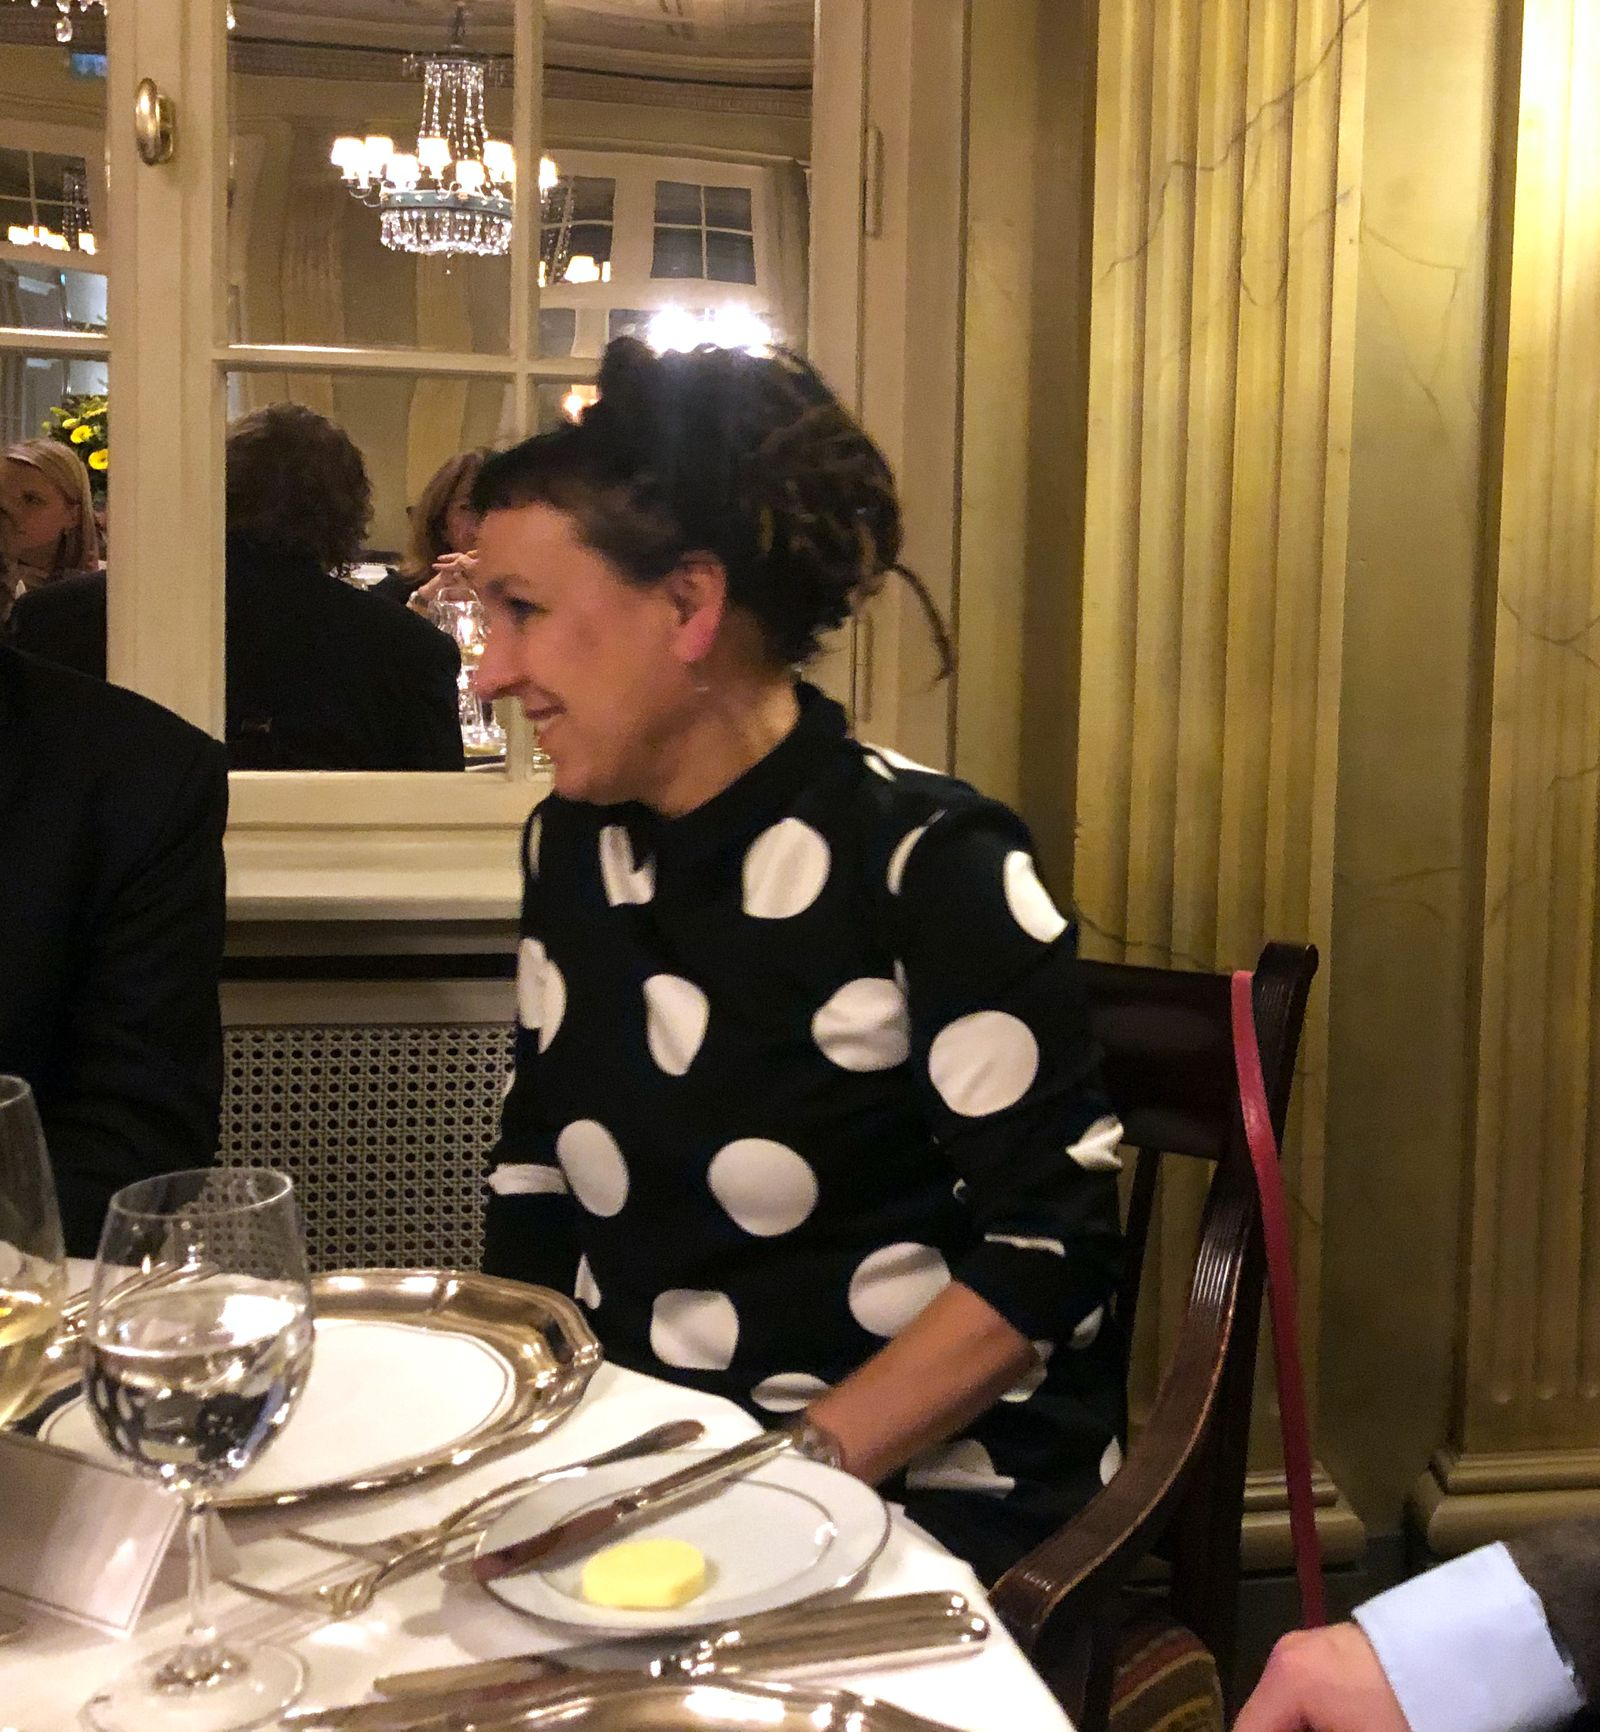 EINMALIGE VERWENDUNG/ Nobelpreis-Dinner/ Olga Tokarczuk